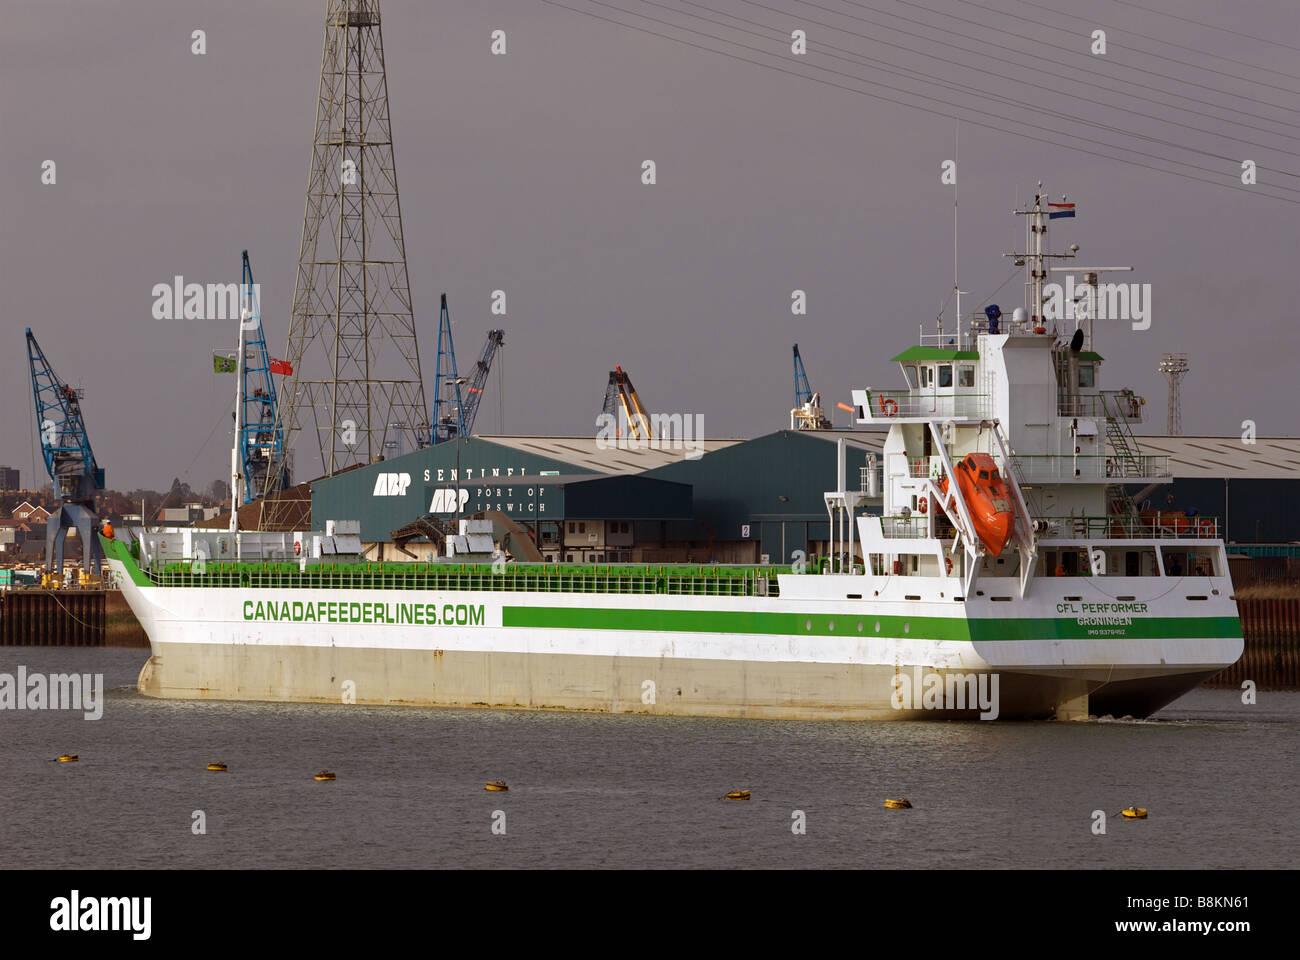 Port of Ipswich, Suffolk, UK. - Stock Image